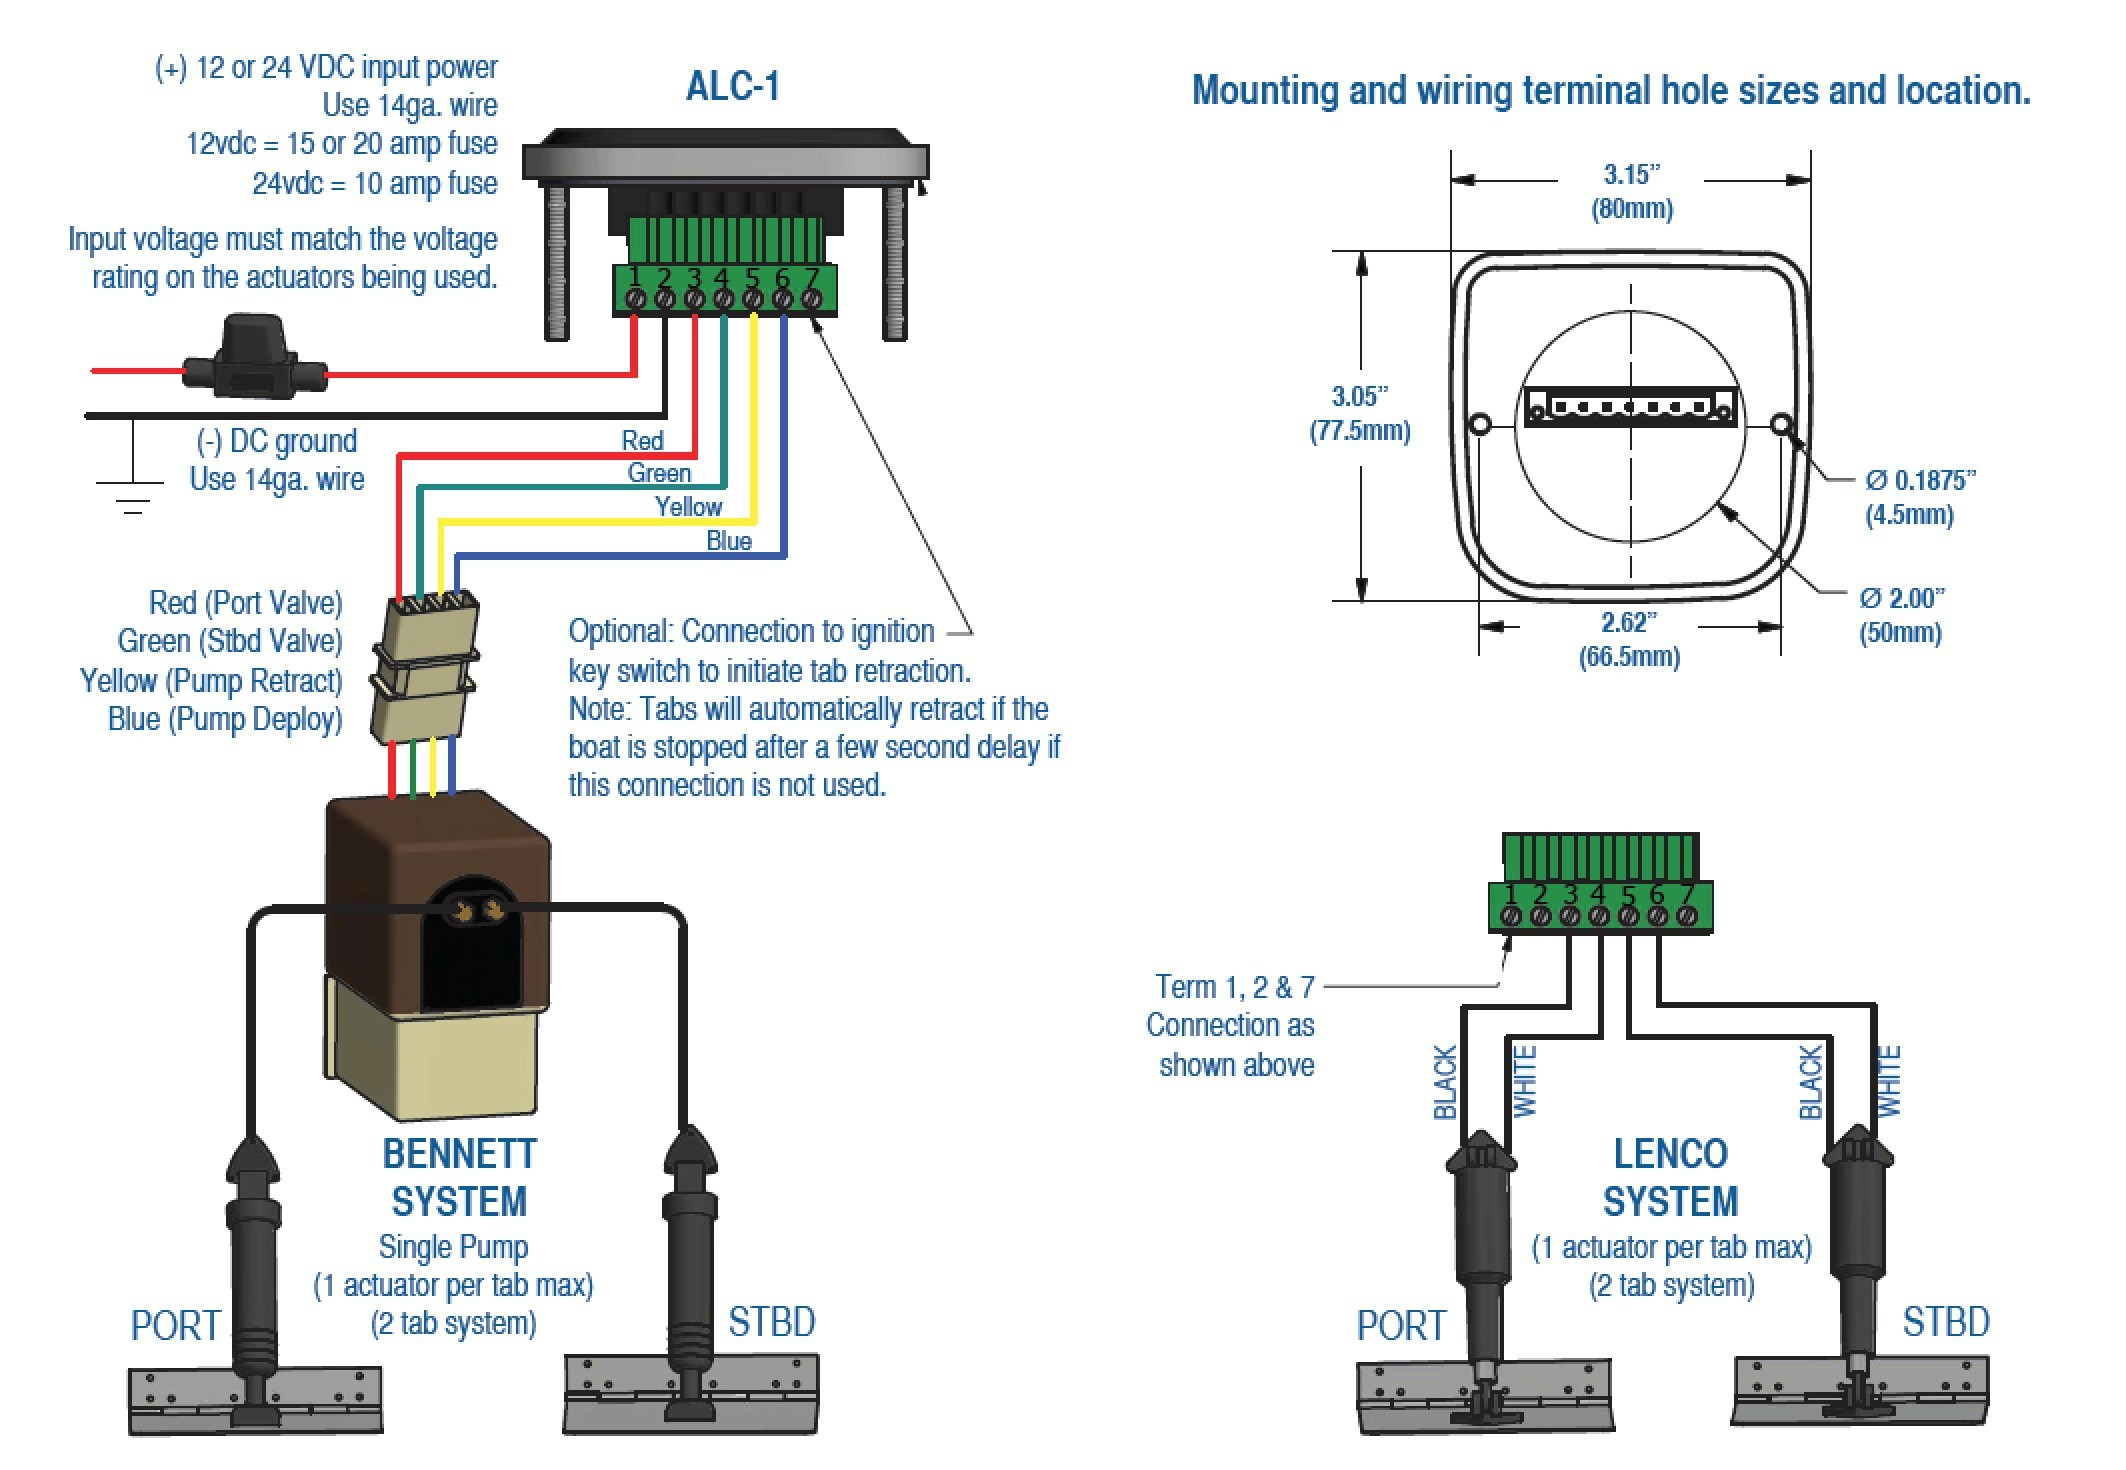 Lenco Trim Tab Wiring Diagram | Wiring Diagram - Bennett Trim Tab Wiring Diagram